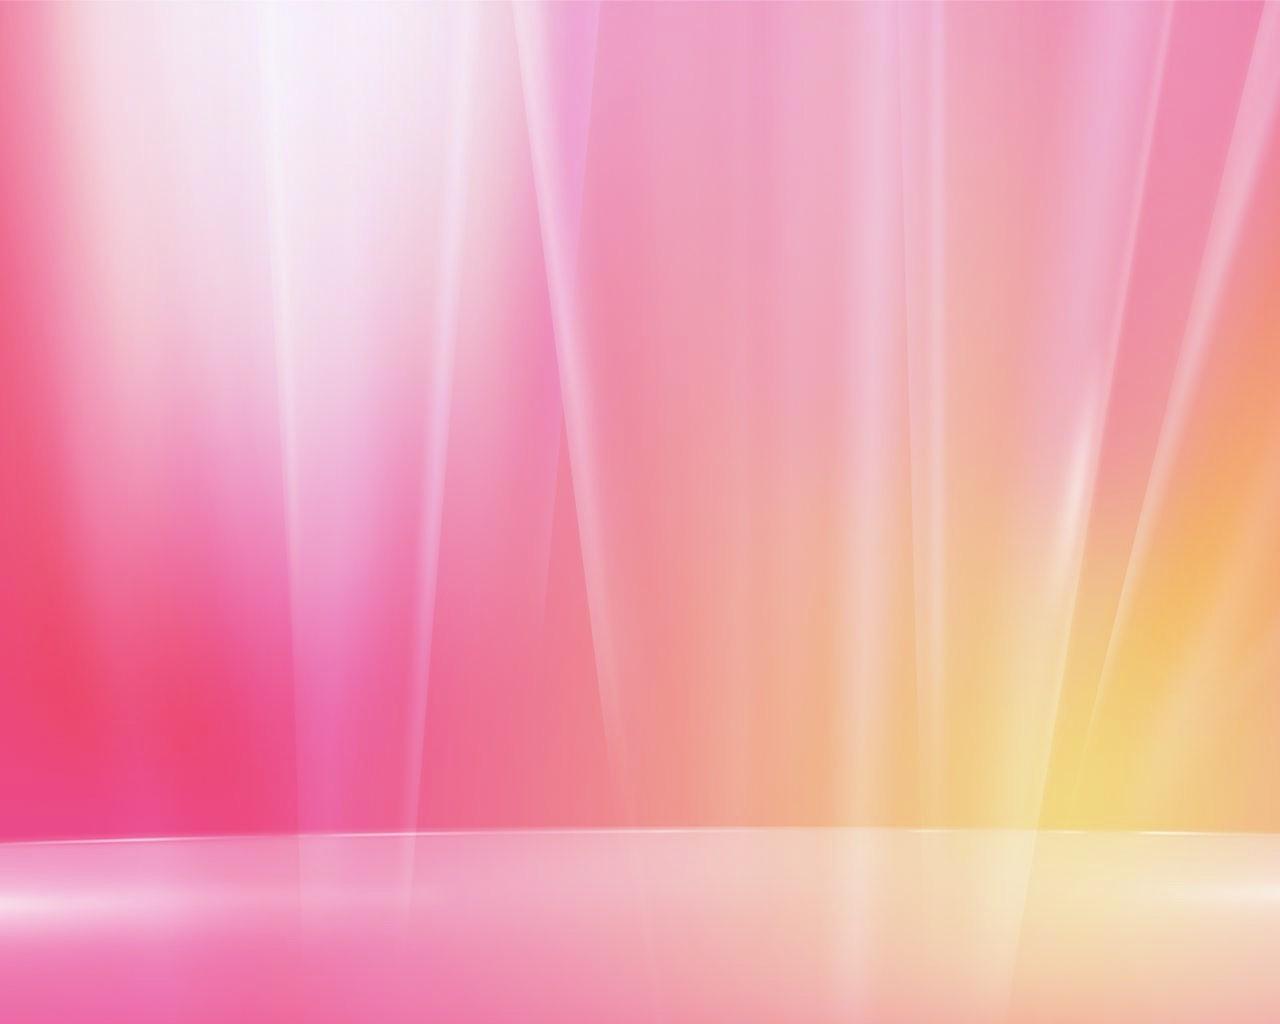 Pink Color Pink Wallpaper 1280x1024